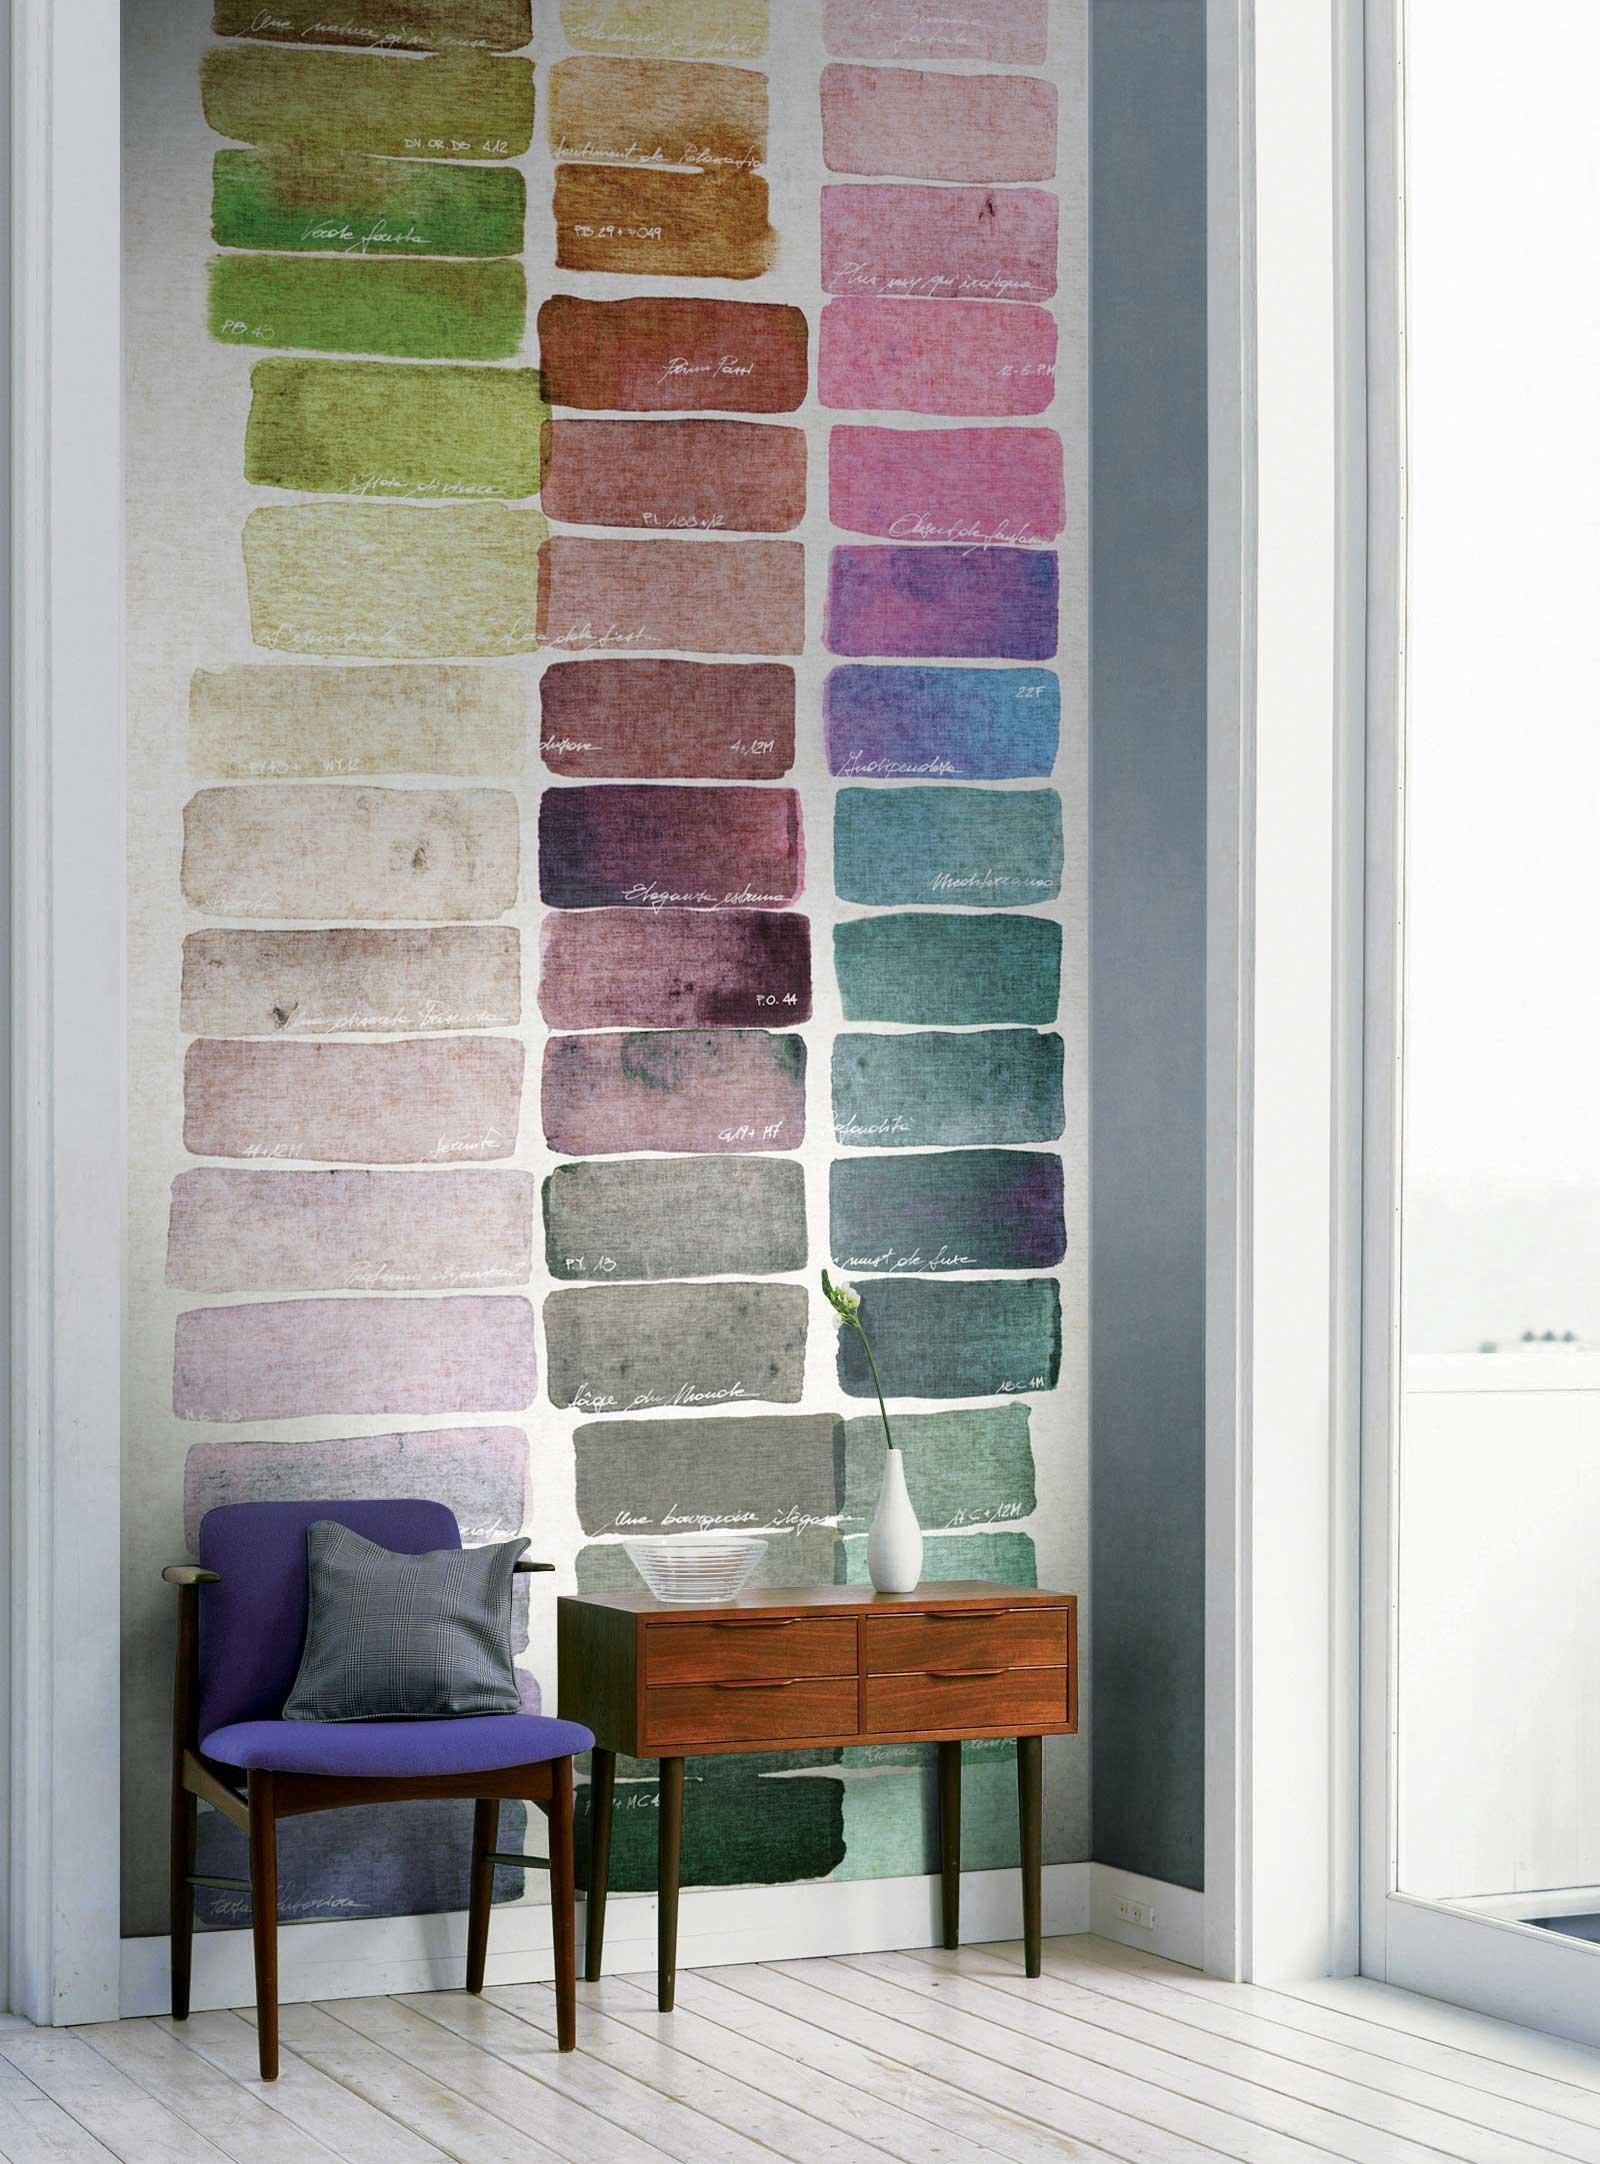 Carte da parati per arredare le pareti cose di casa for Carta parati mattoni leroy merlin